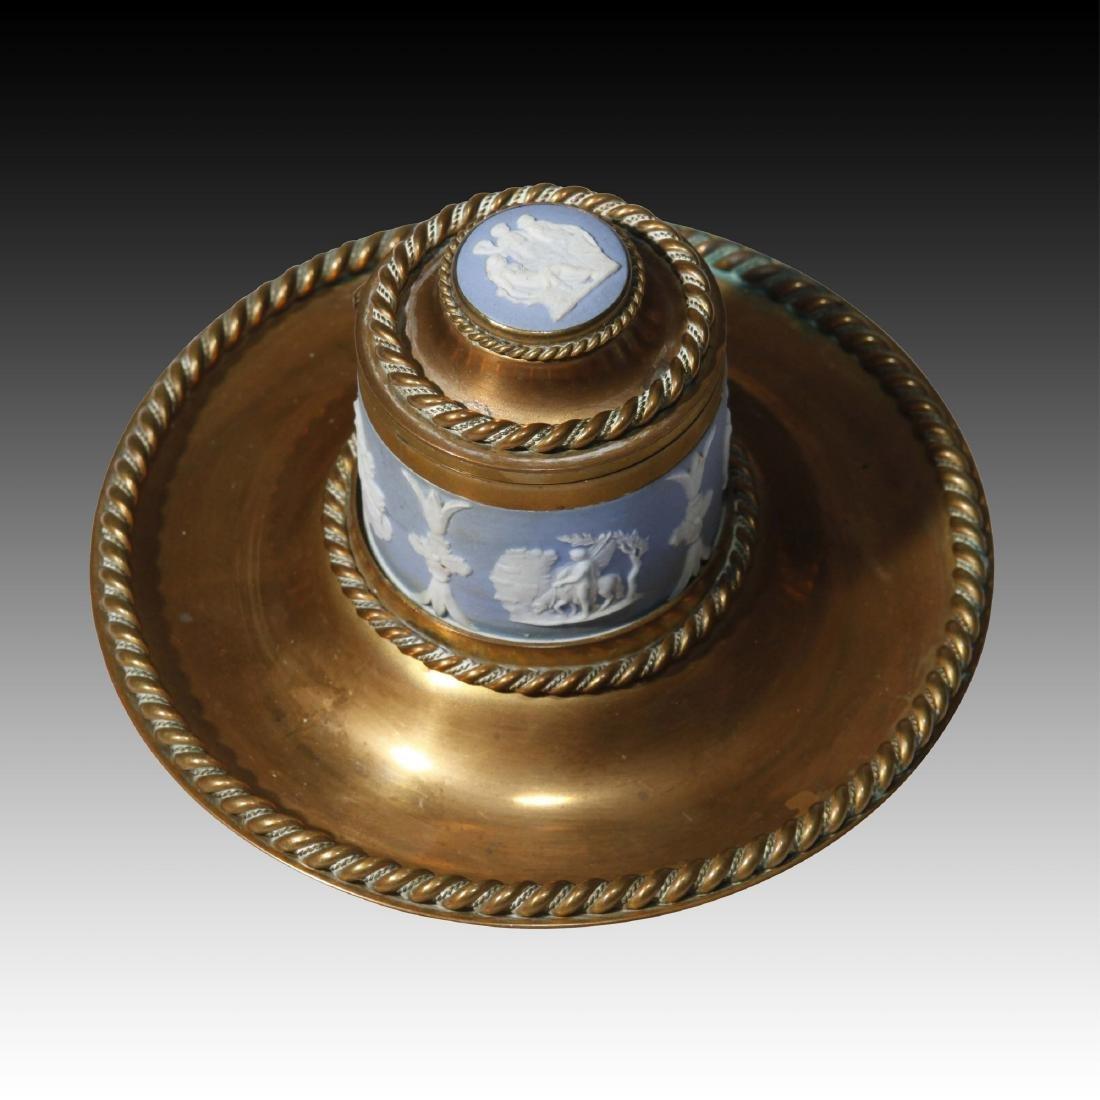 Antique Bronze and Wedgwood Jasperware inkwell